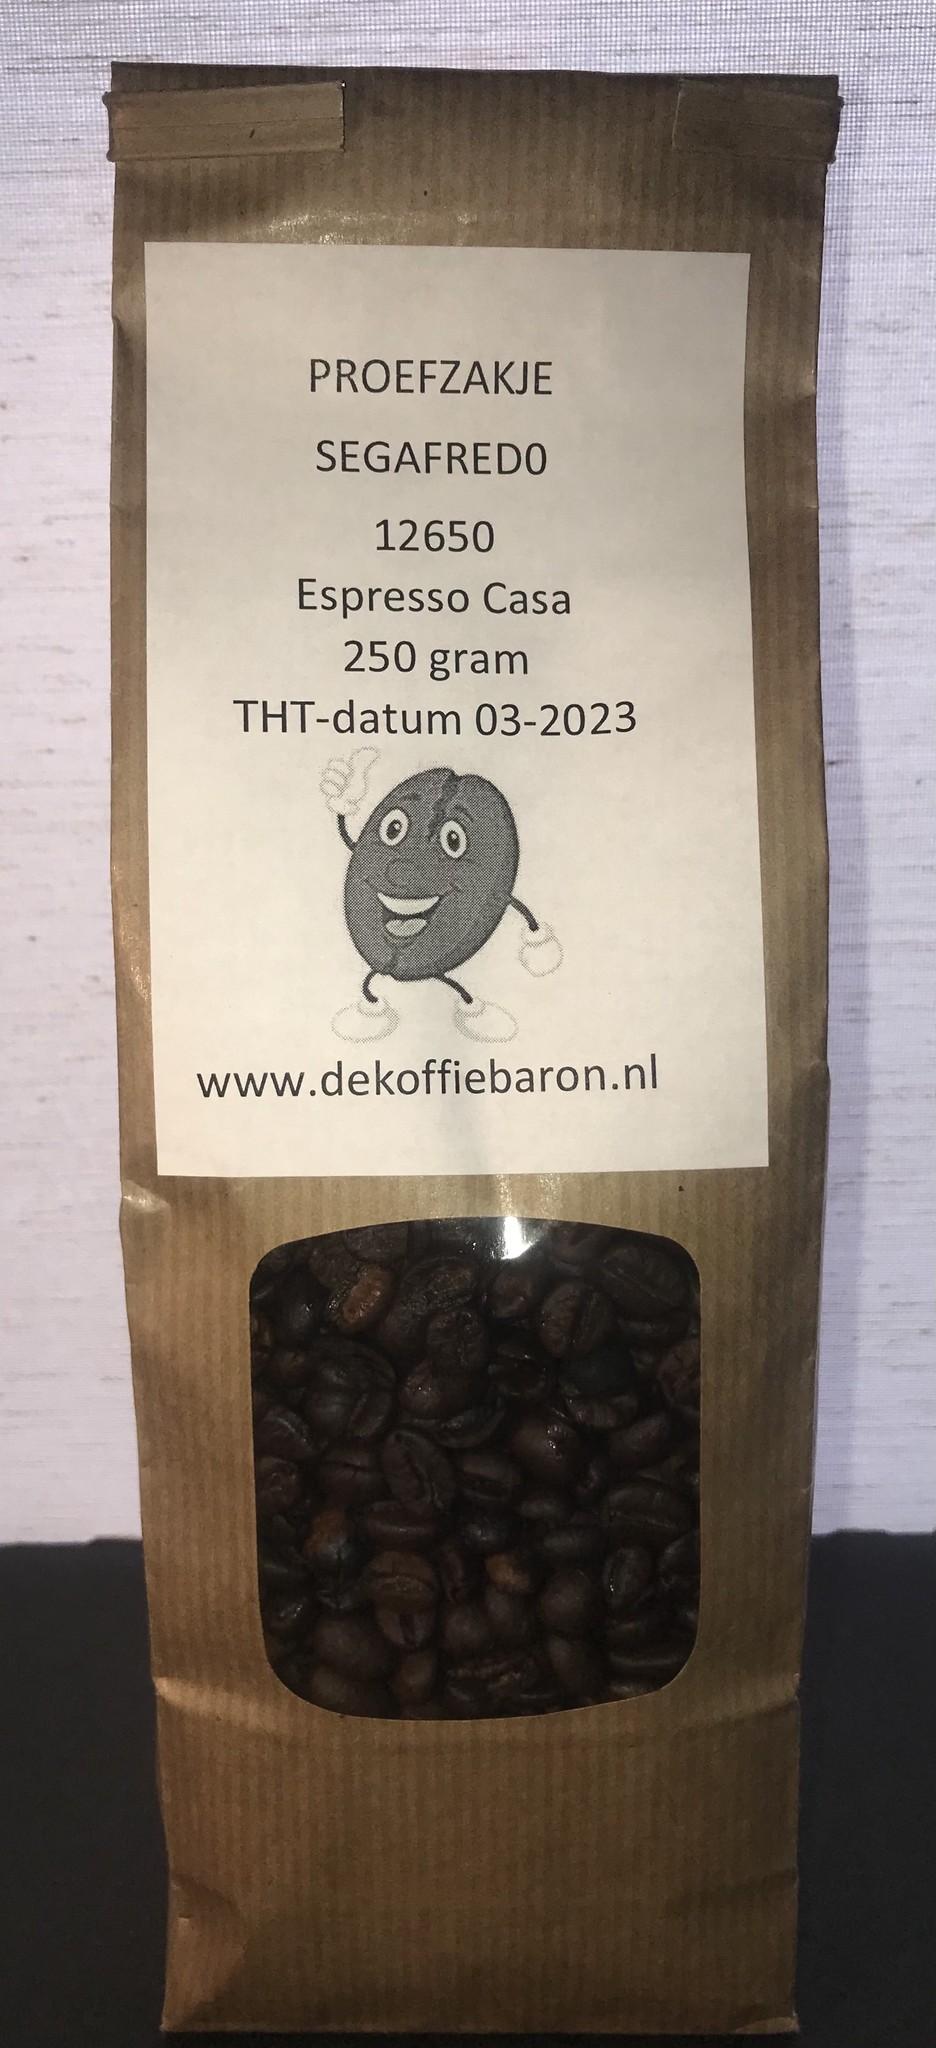 Segafredo Espresso casa Bohnen 1 kg, ab € 6.95